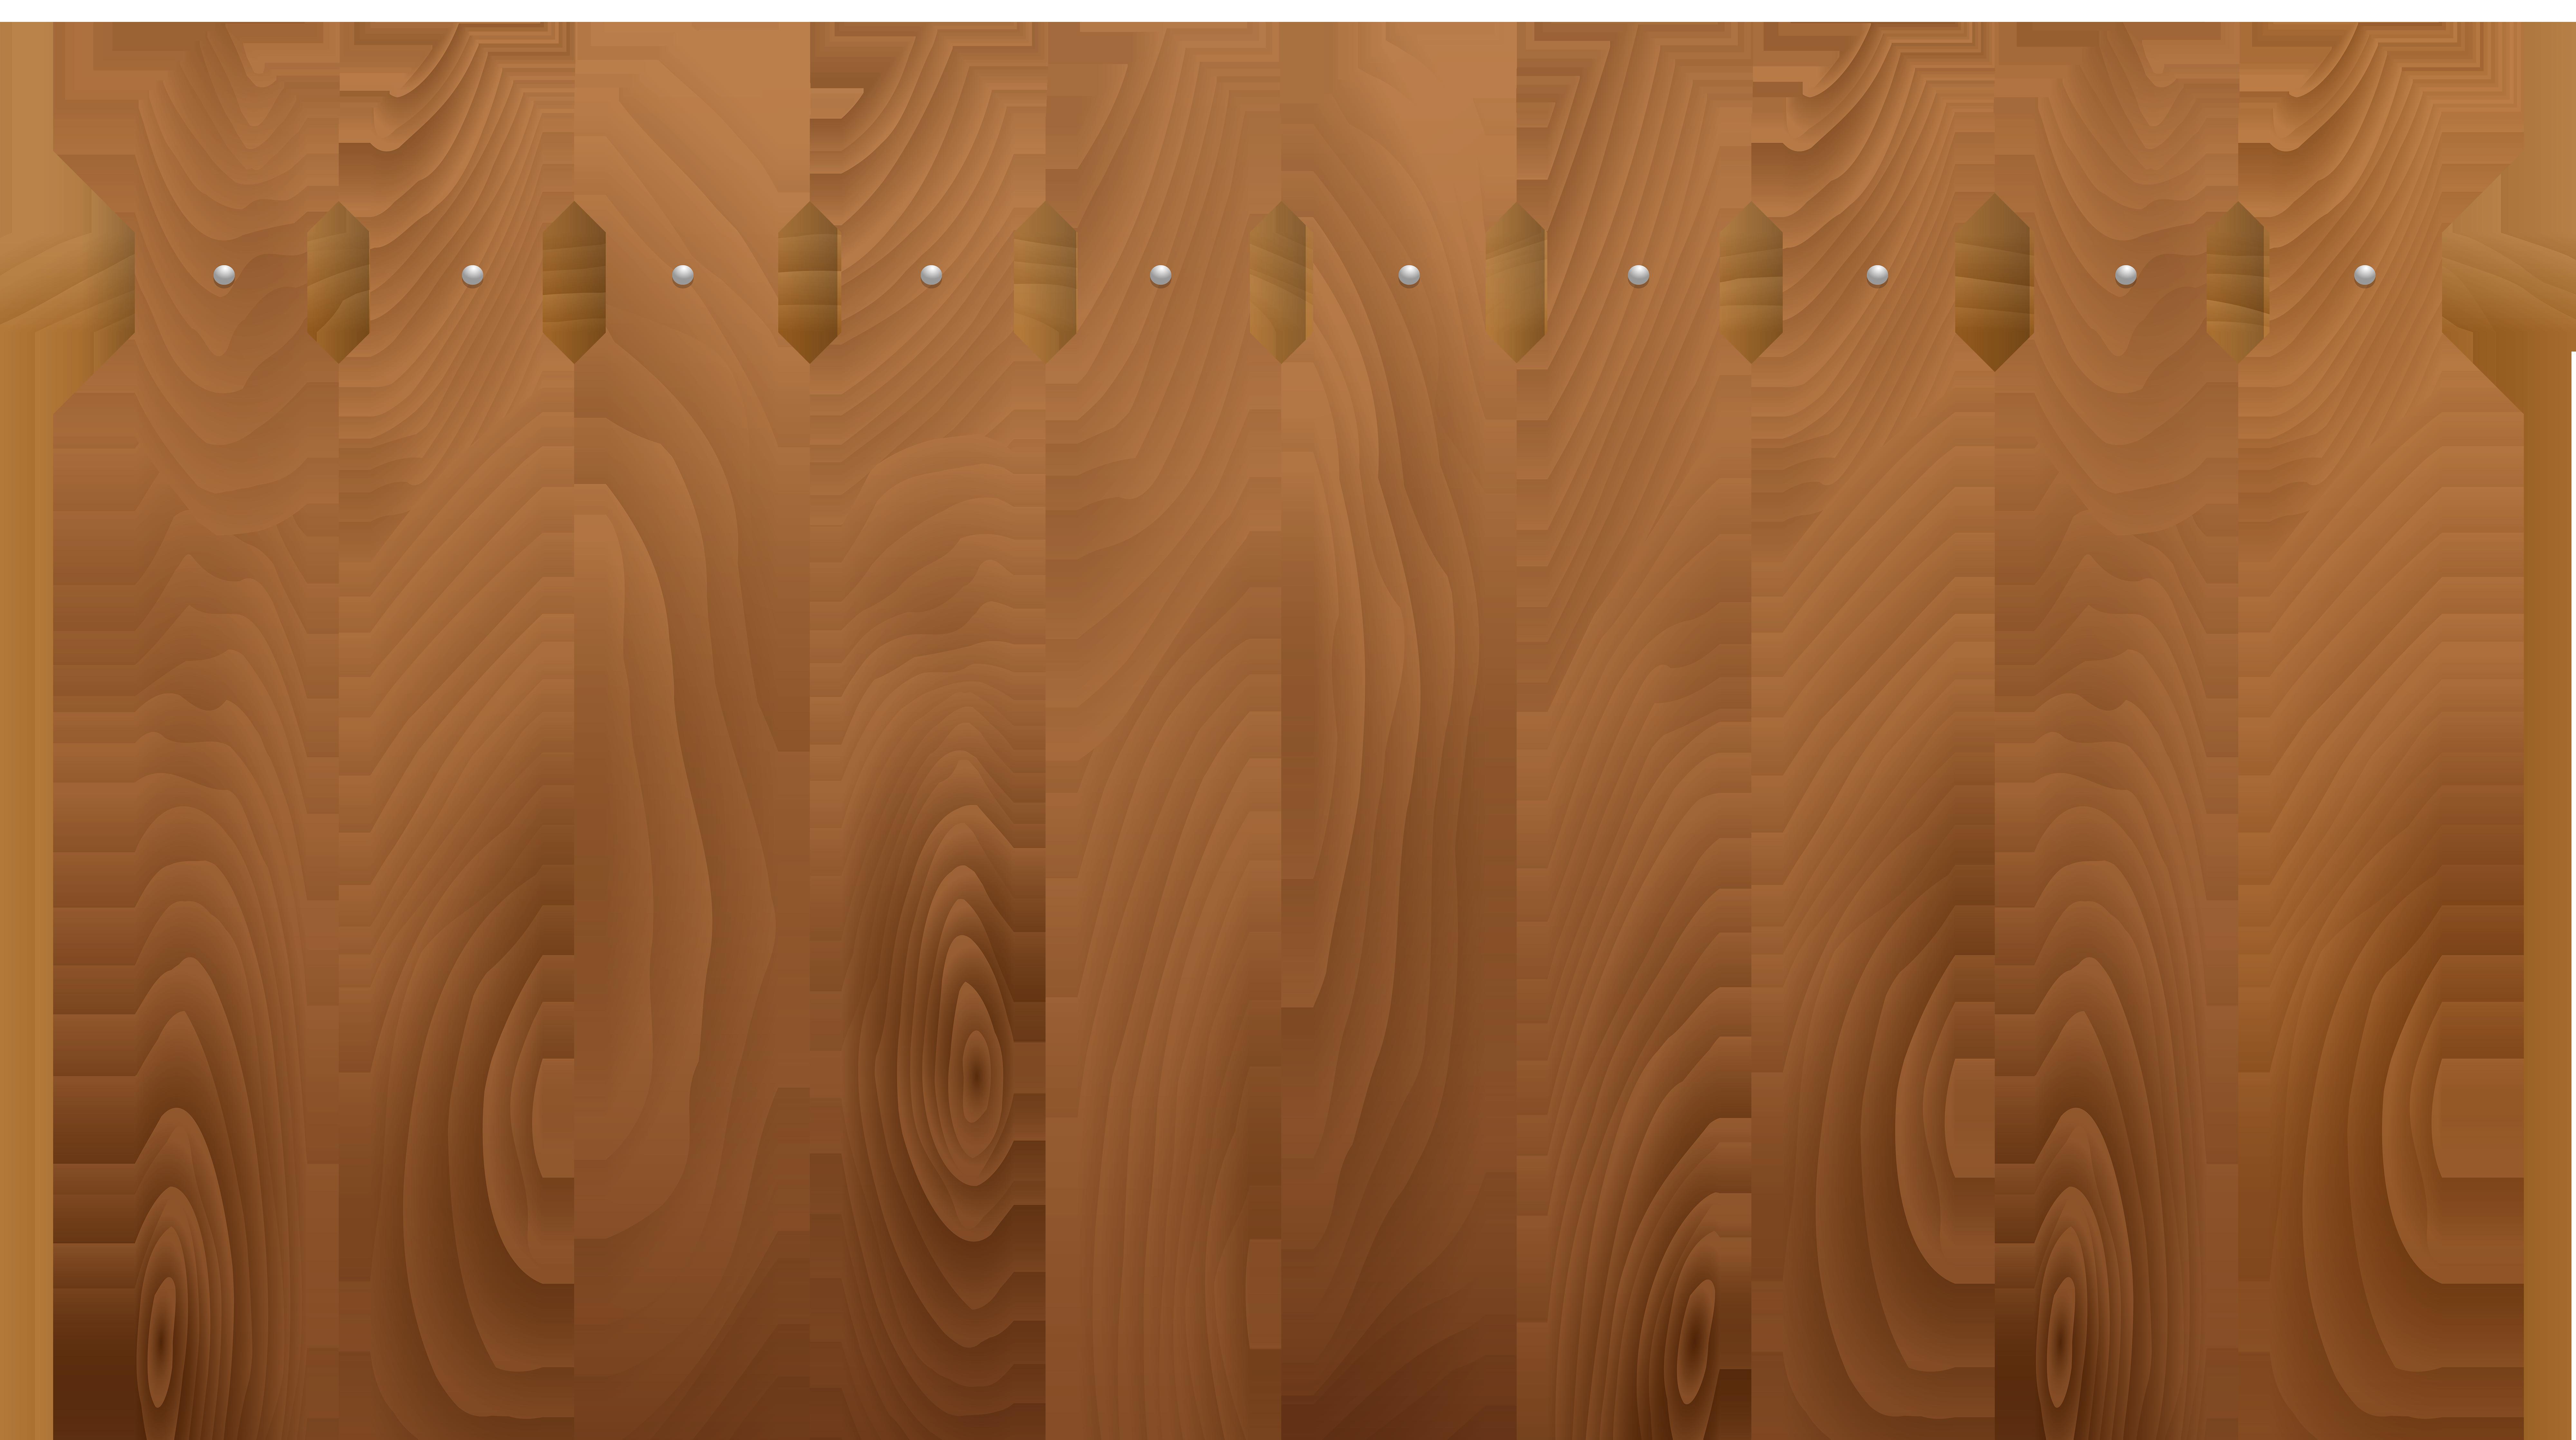 Wooden Fence Transparent Clip Art PNG Image.